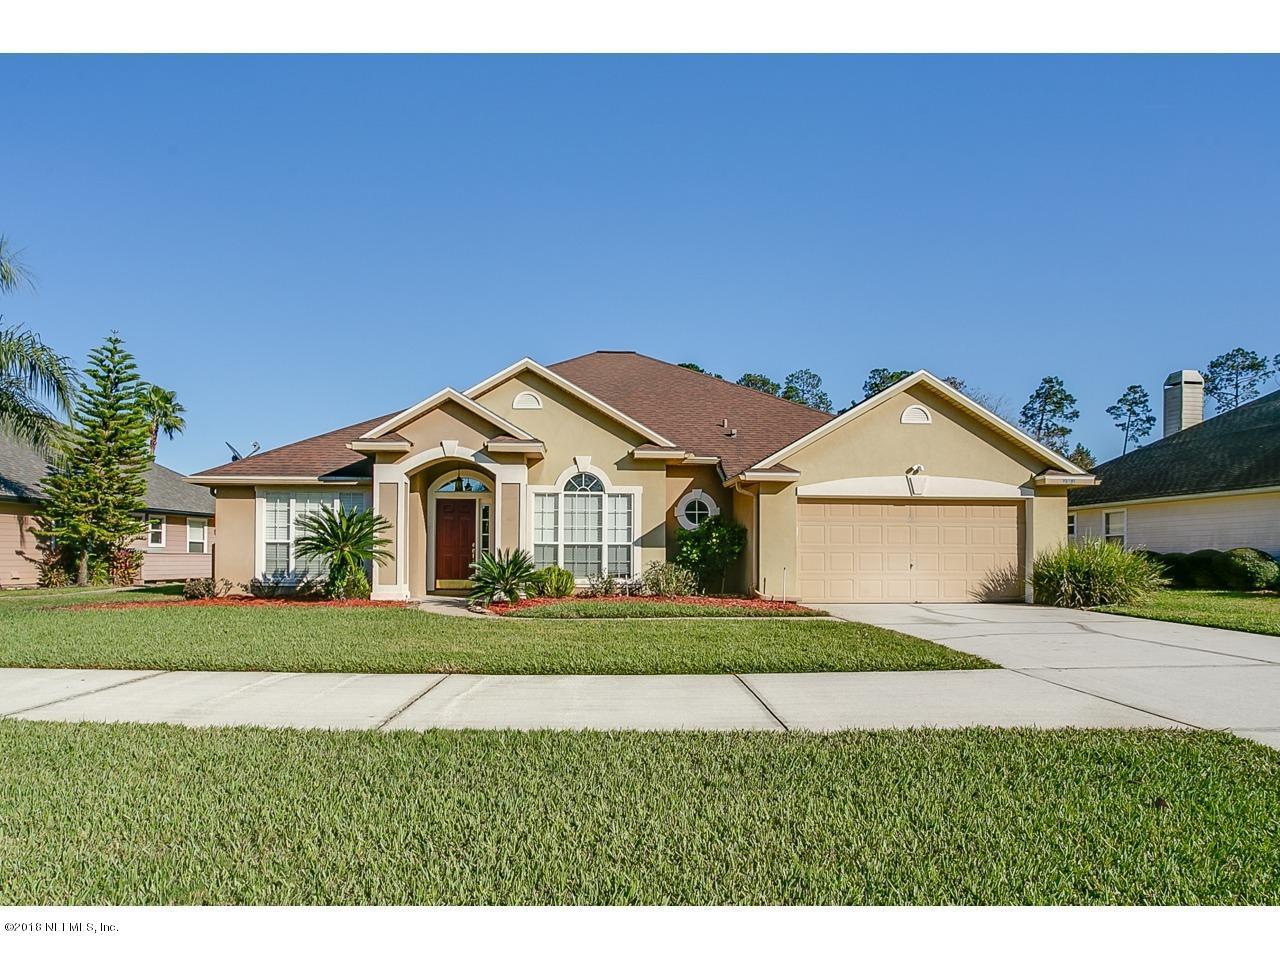 2362 EAGLE HARBOR, FLEMING ISLAND, FLORIDA 32003, 3 Bedrooms Bedrooms, ,3 BathroomsBathrooms,Residential - single family,For sale,EAGLE HARBOR,969810